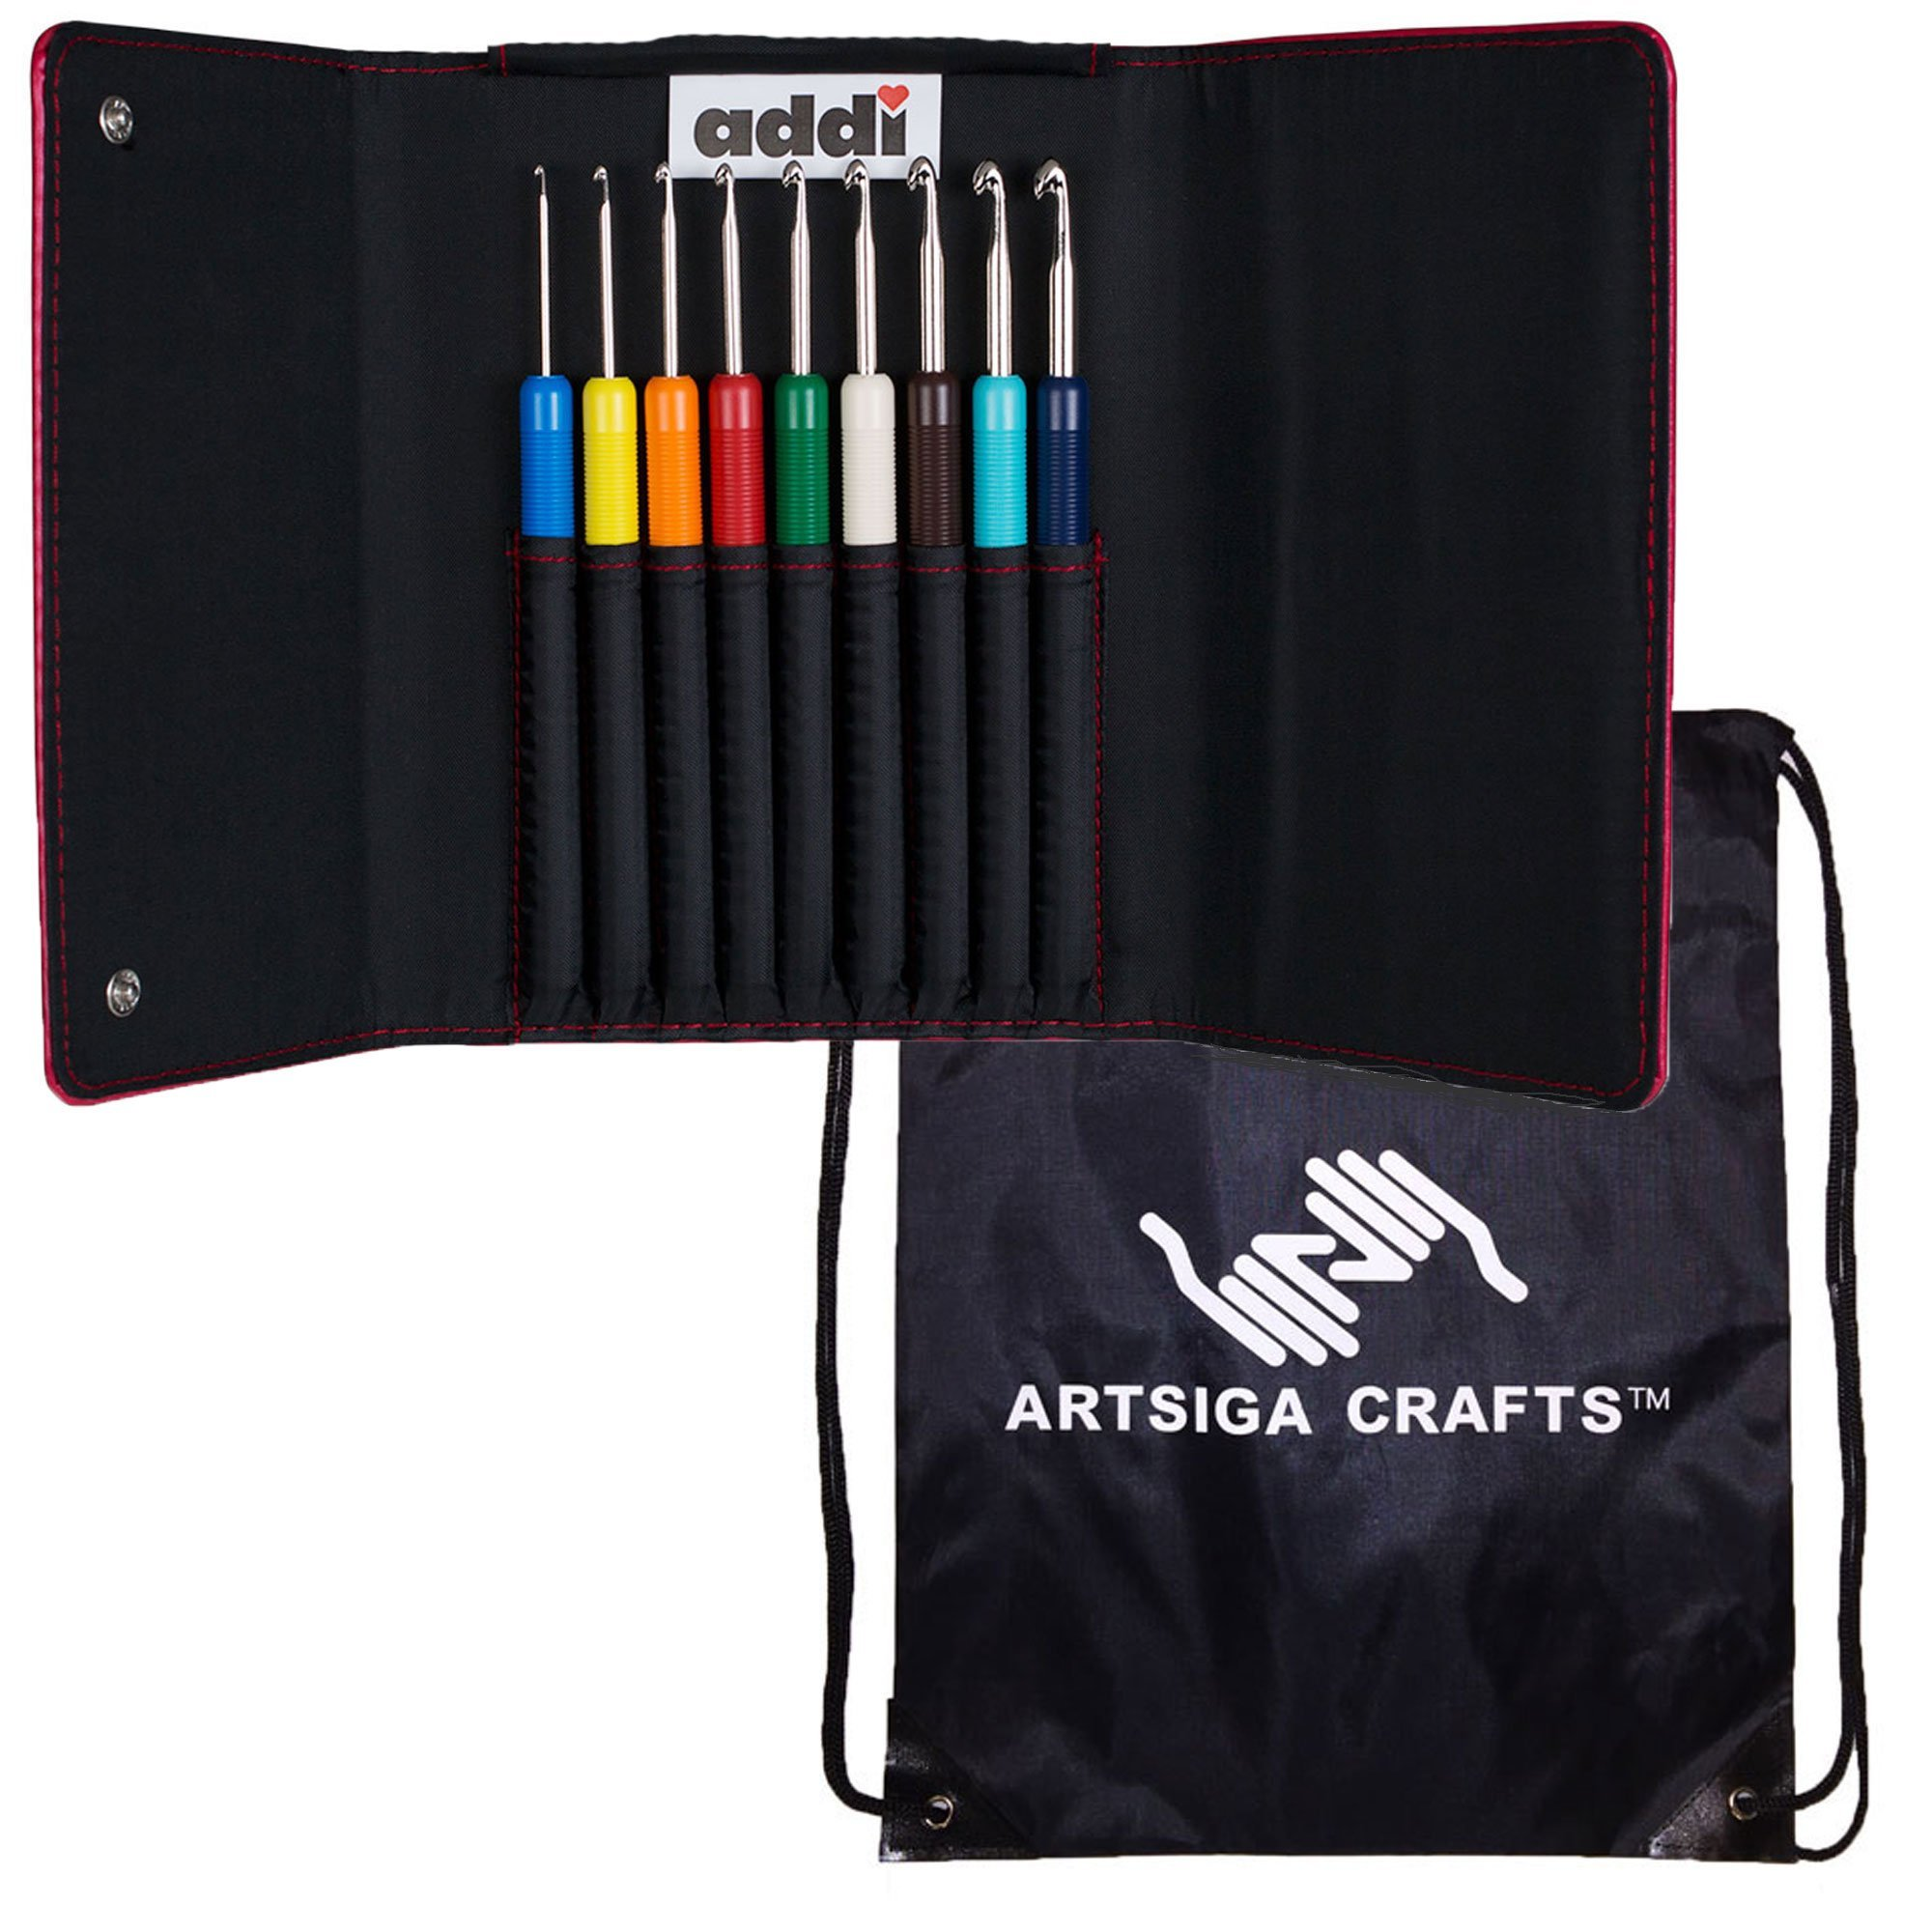 addi Knitting Needles Crochet Hook Colours Set Bundle with 1 Artsiga Crafts Project Bag